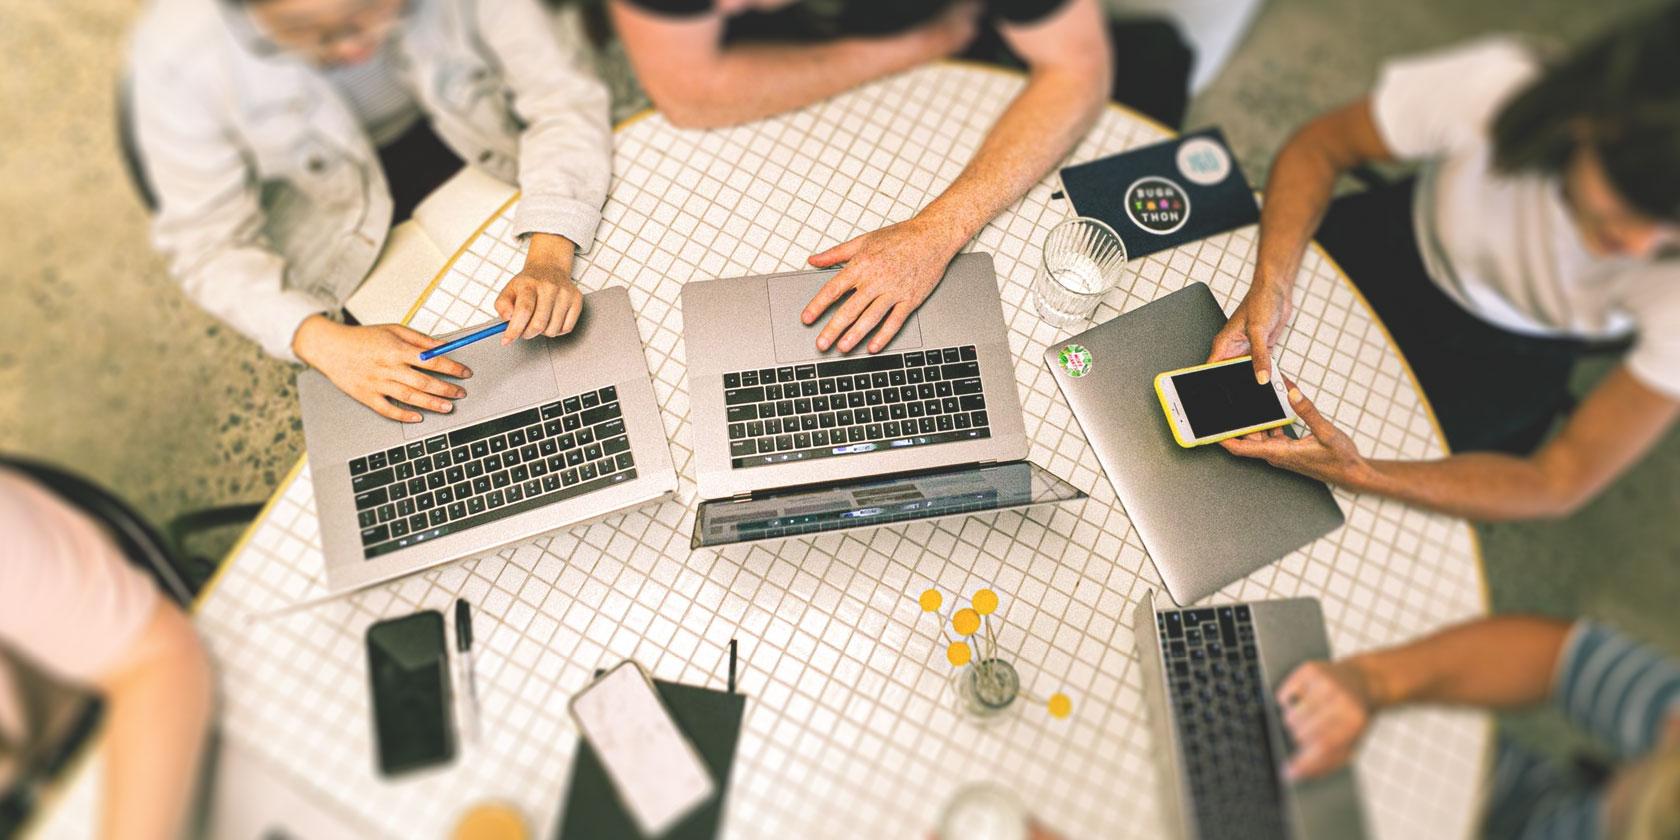 organize-meetings